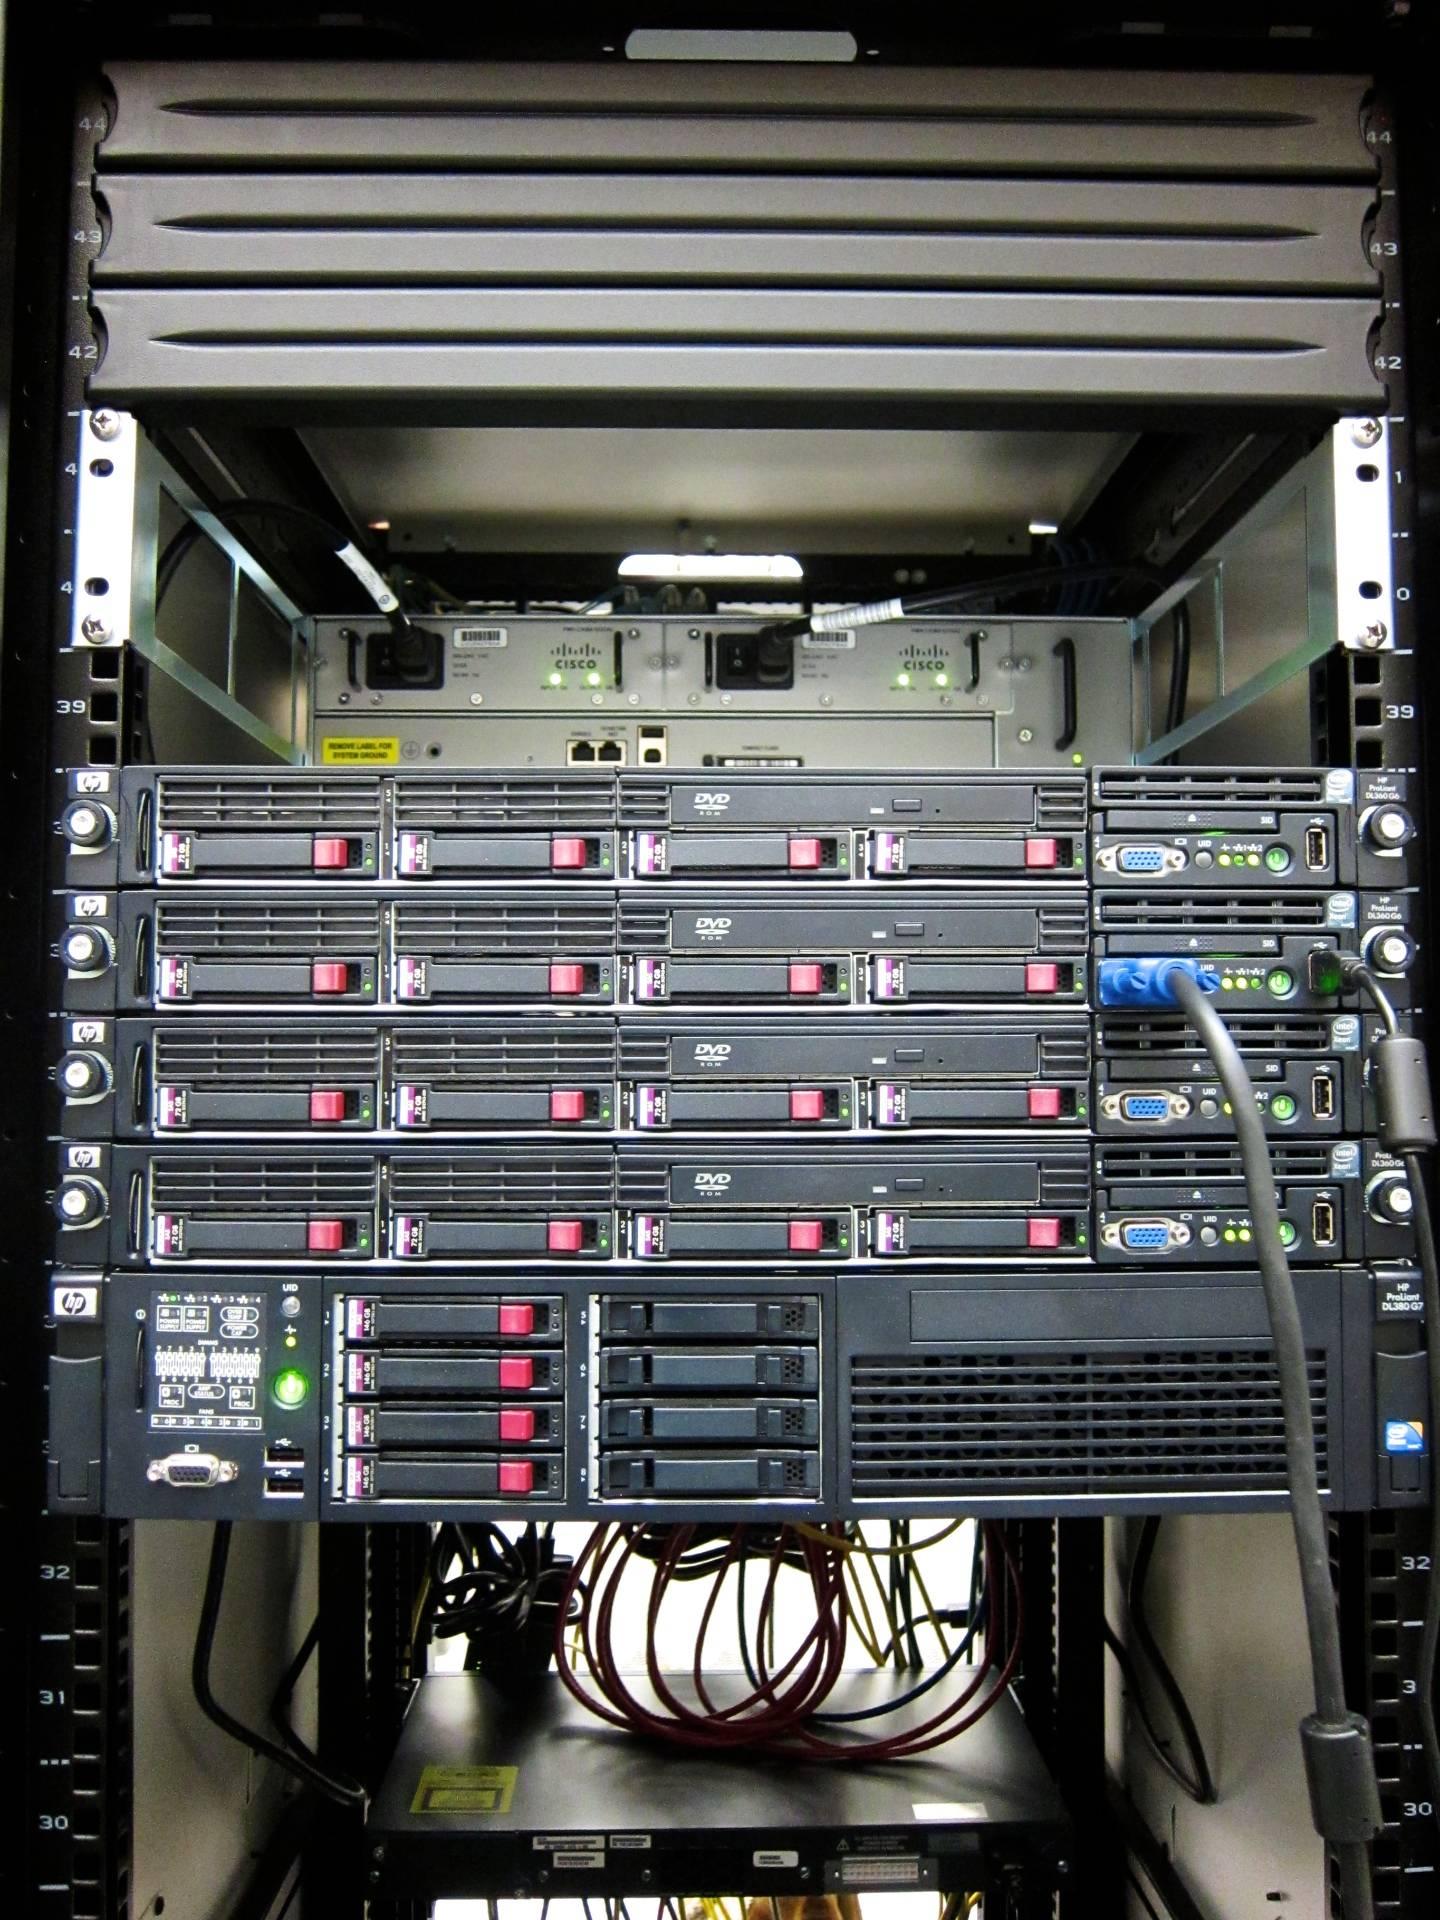 Network Wiring Closet Organizers Diagram